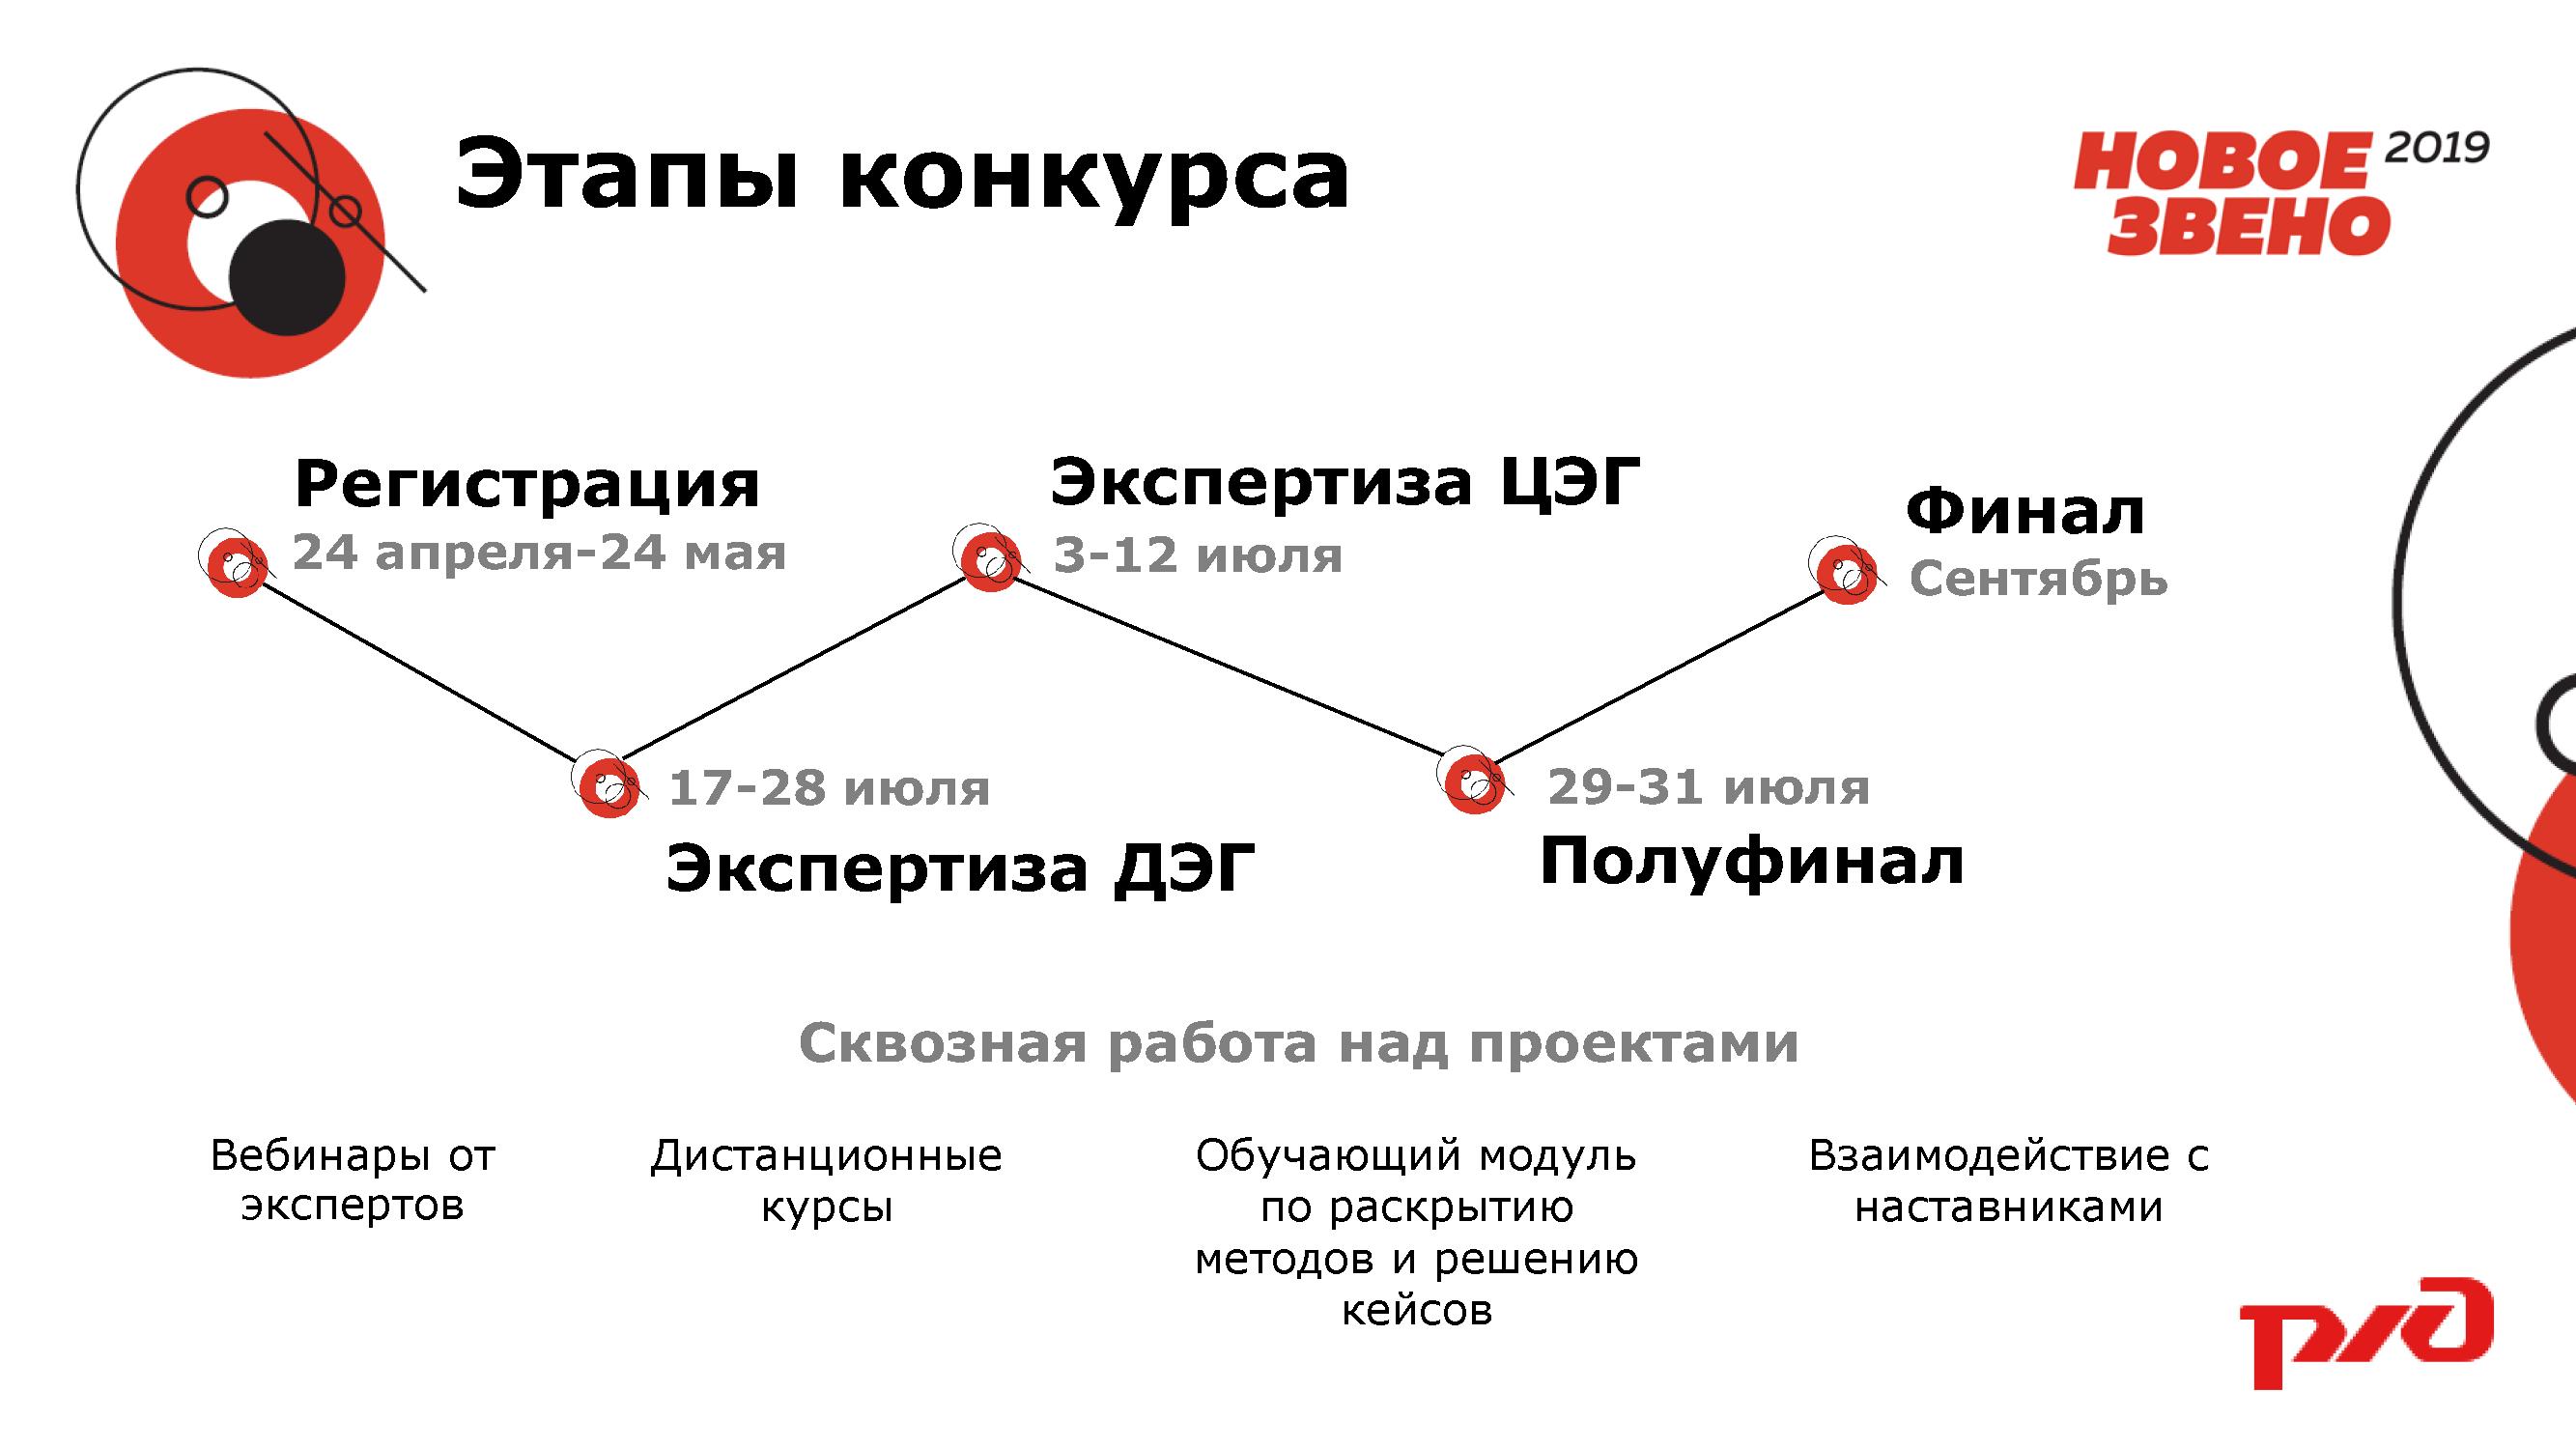 Общая презентация_Новое звено ИТОГ_Страница_4